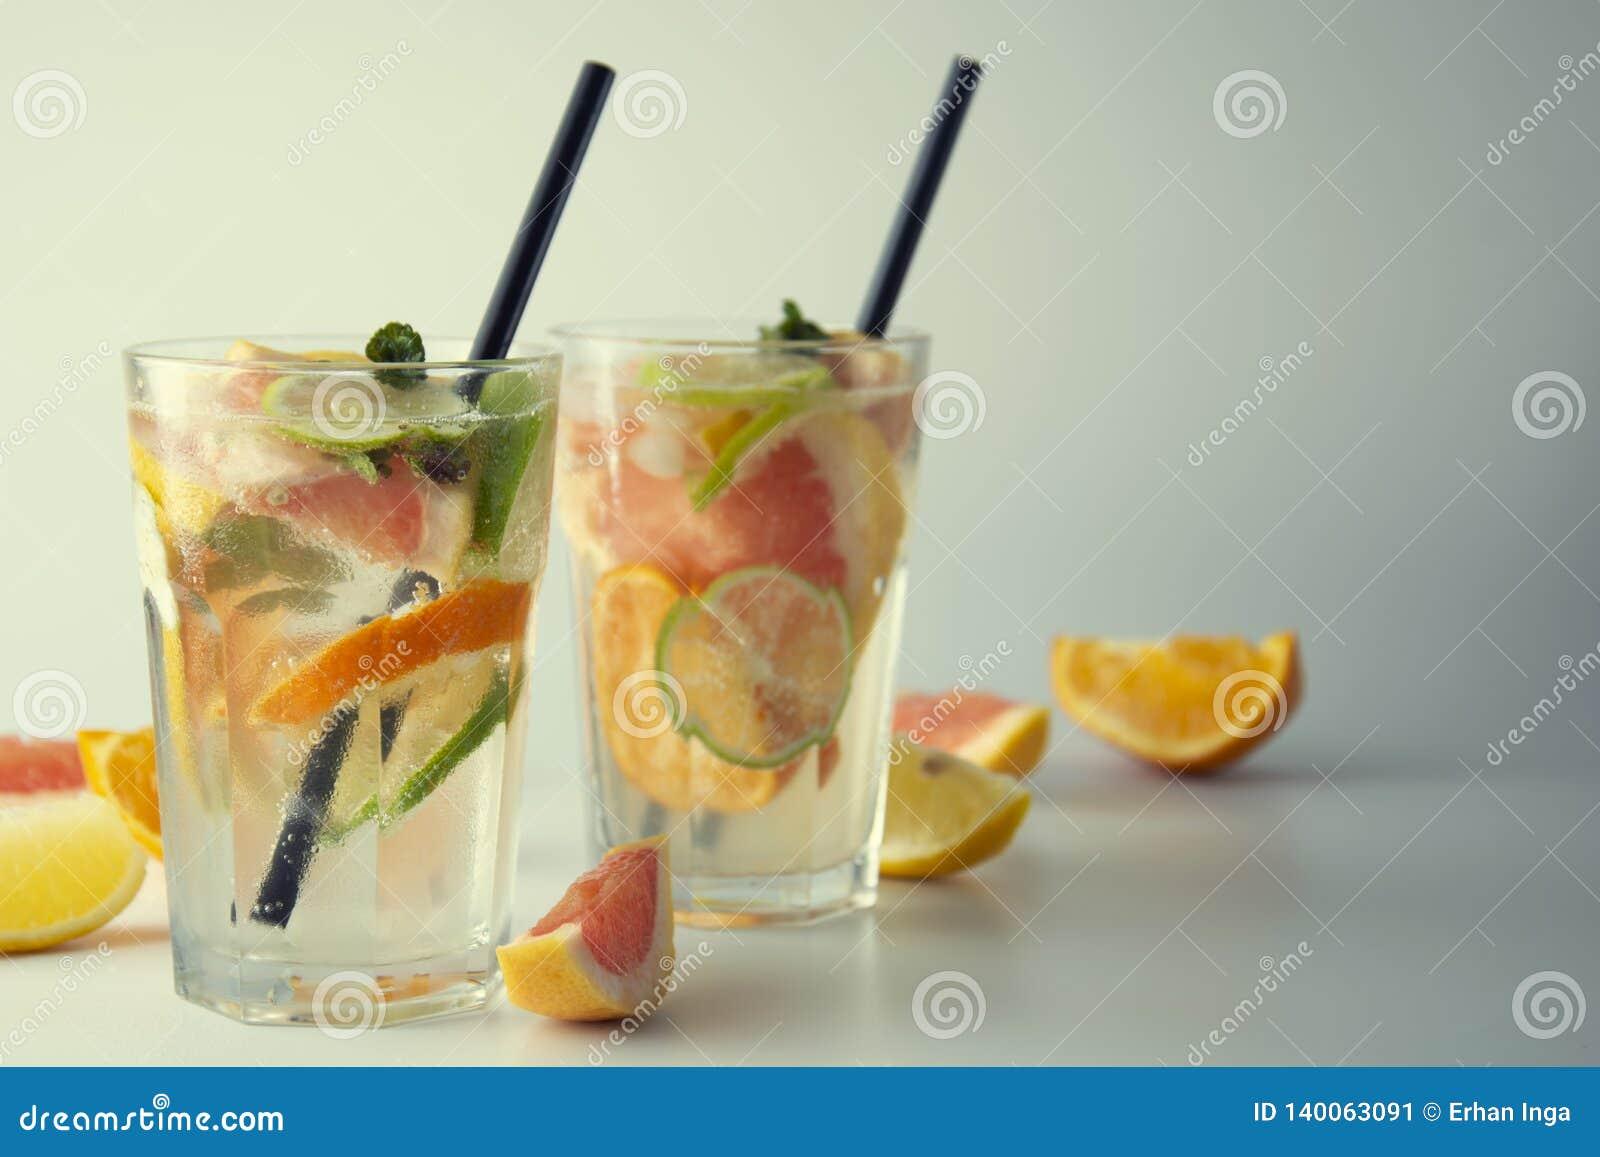 Fresh Lemonade Or Cocktails Refreshing Summer Homemade Cocktail With Lemon Lime Orange And Grapefruit Two Glasses Or Fruit Stock Image Image Of Drink Ingredient 140063091